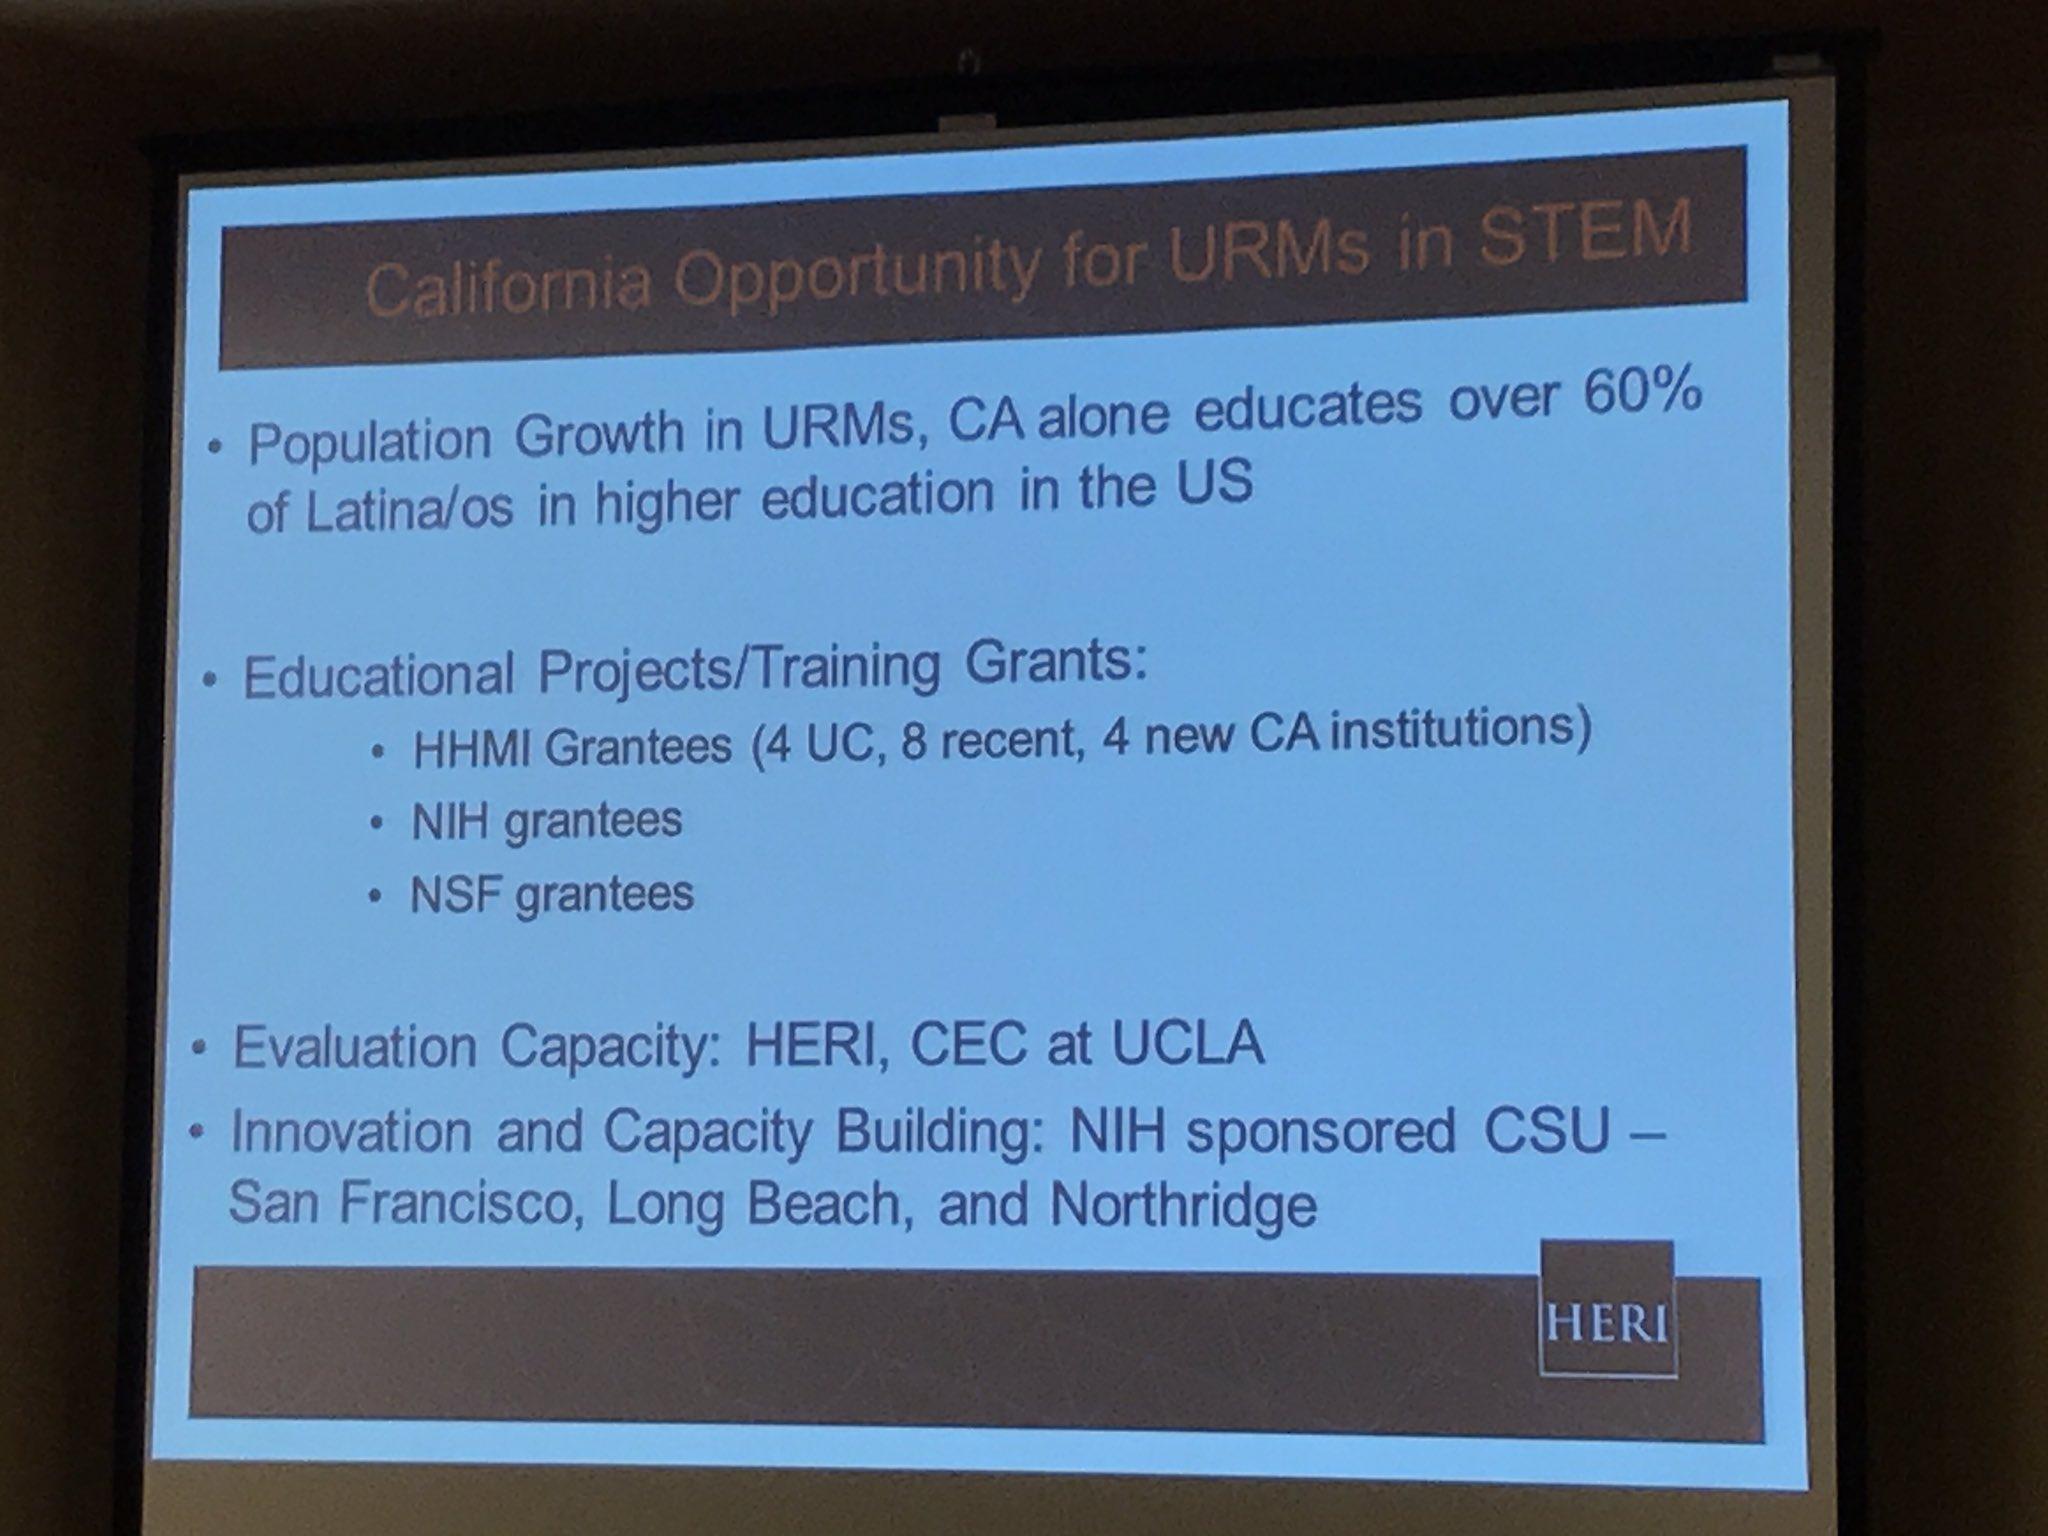 #California #STEM stats via Dr Sylvia Hurtado @CSIC17 https://t.co/8rOks5s0Np